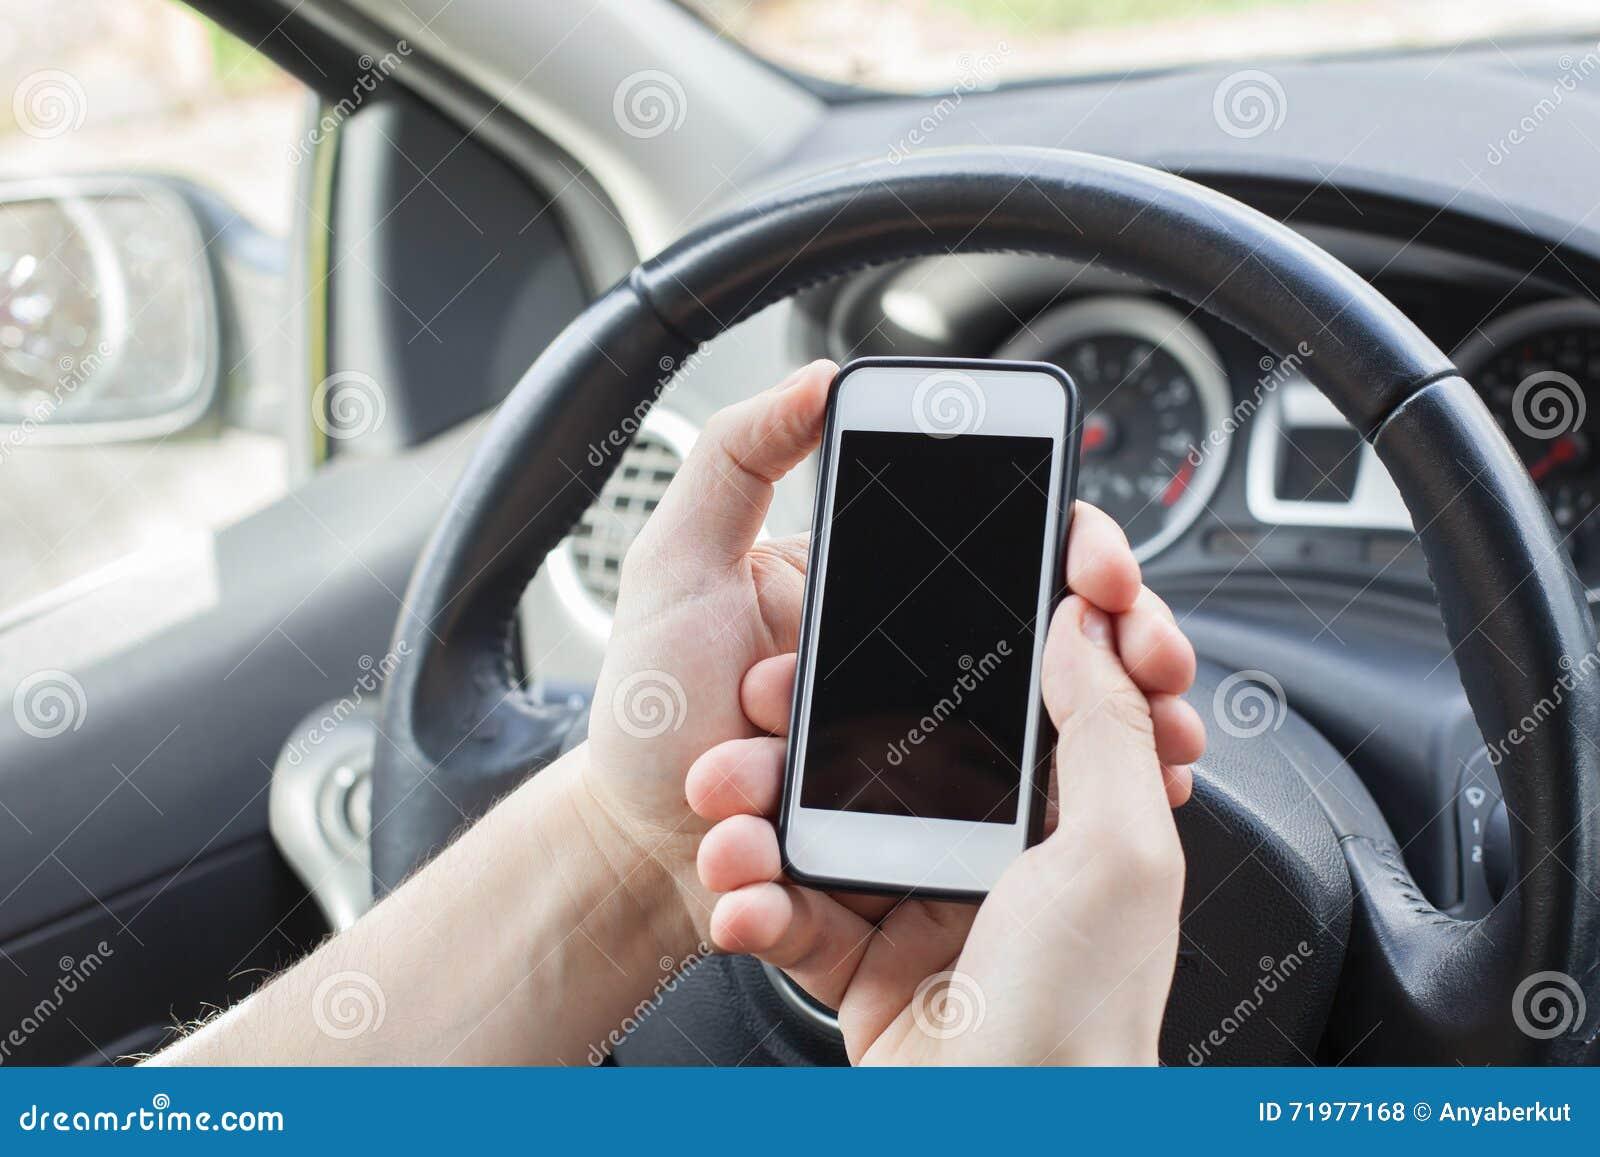 Smartphone in the car